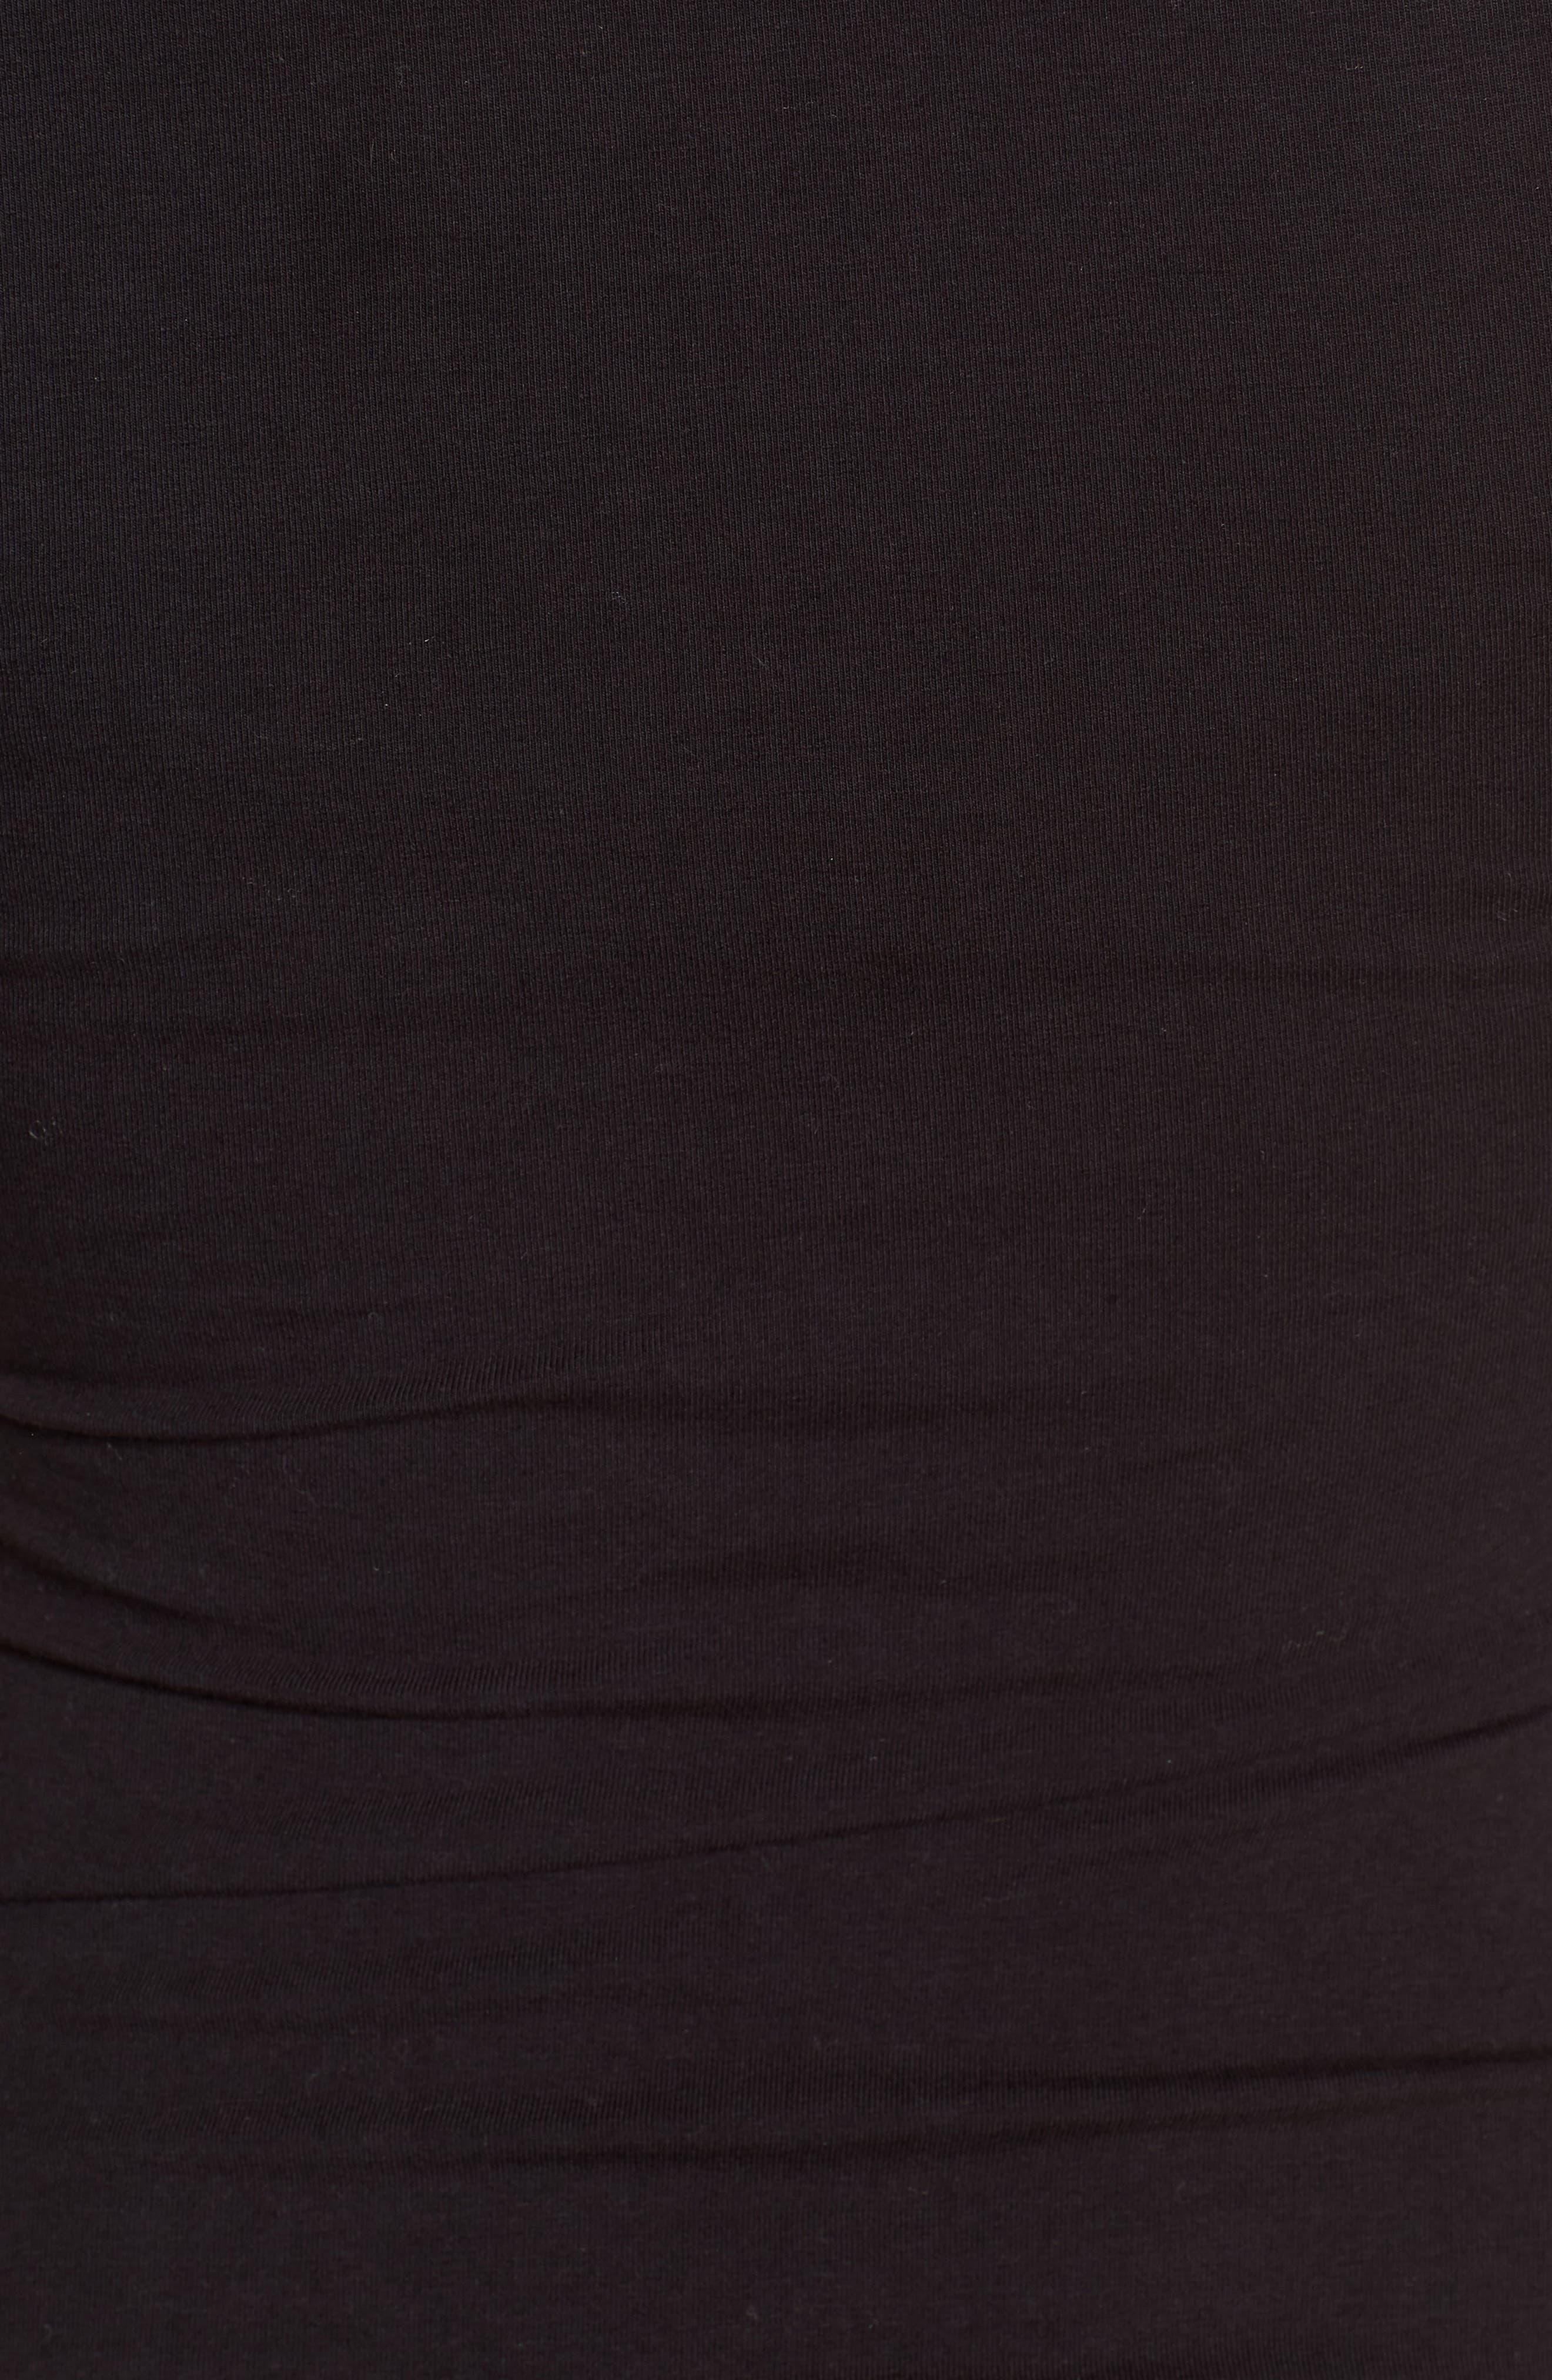 Ruched Surplice Stretch Cotton Body-Con Dress,                             Alternate thumbnail 6, color,                             BLACK